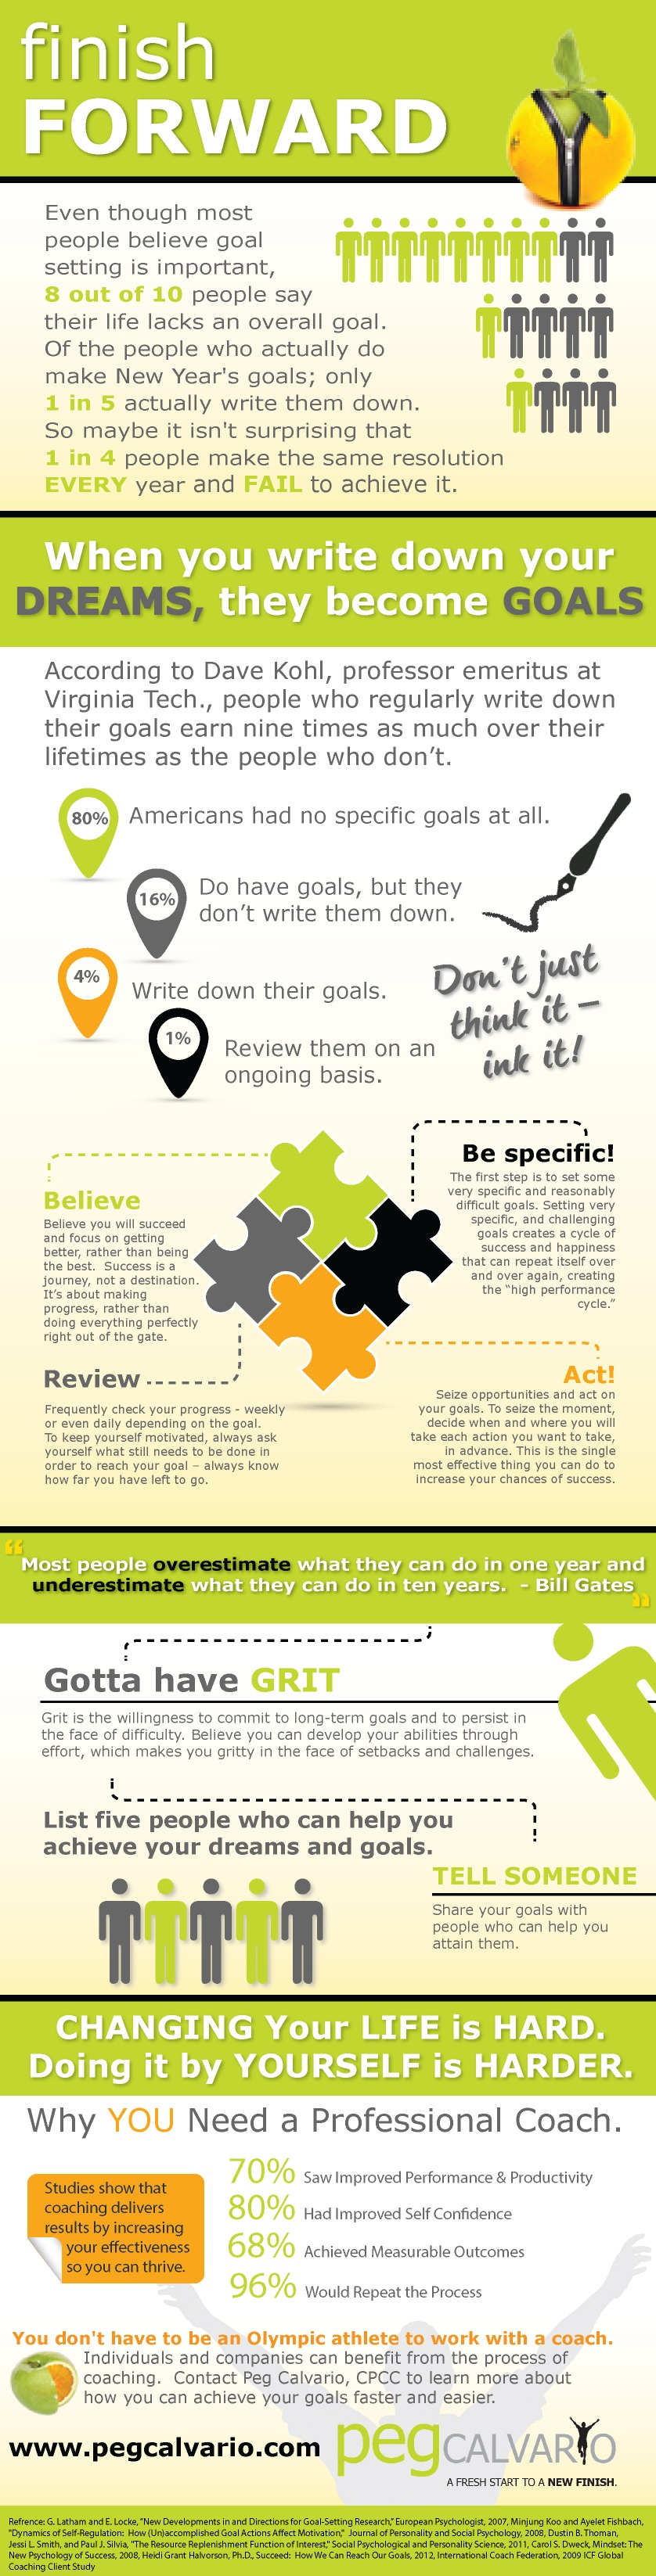 Goal Planning Tips